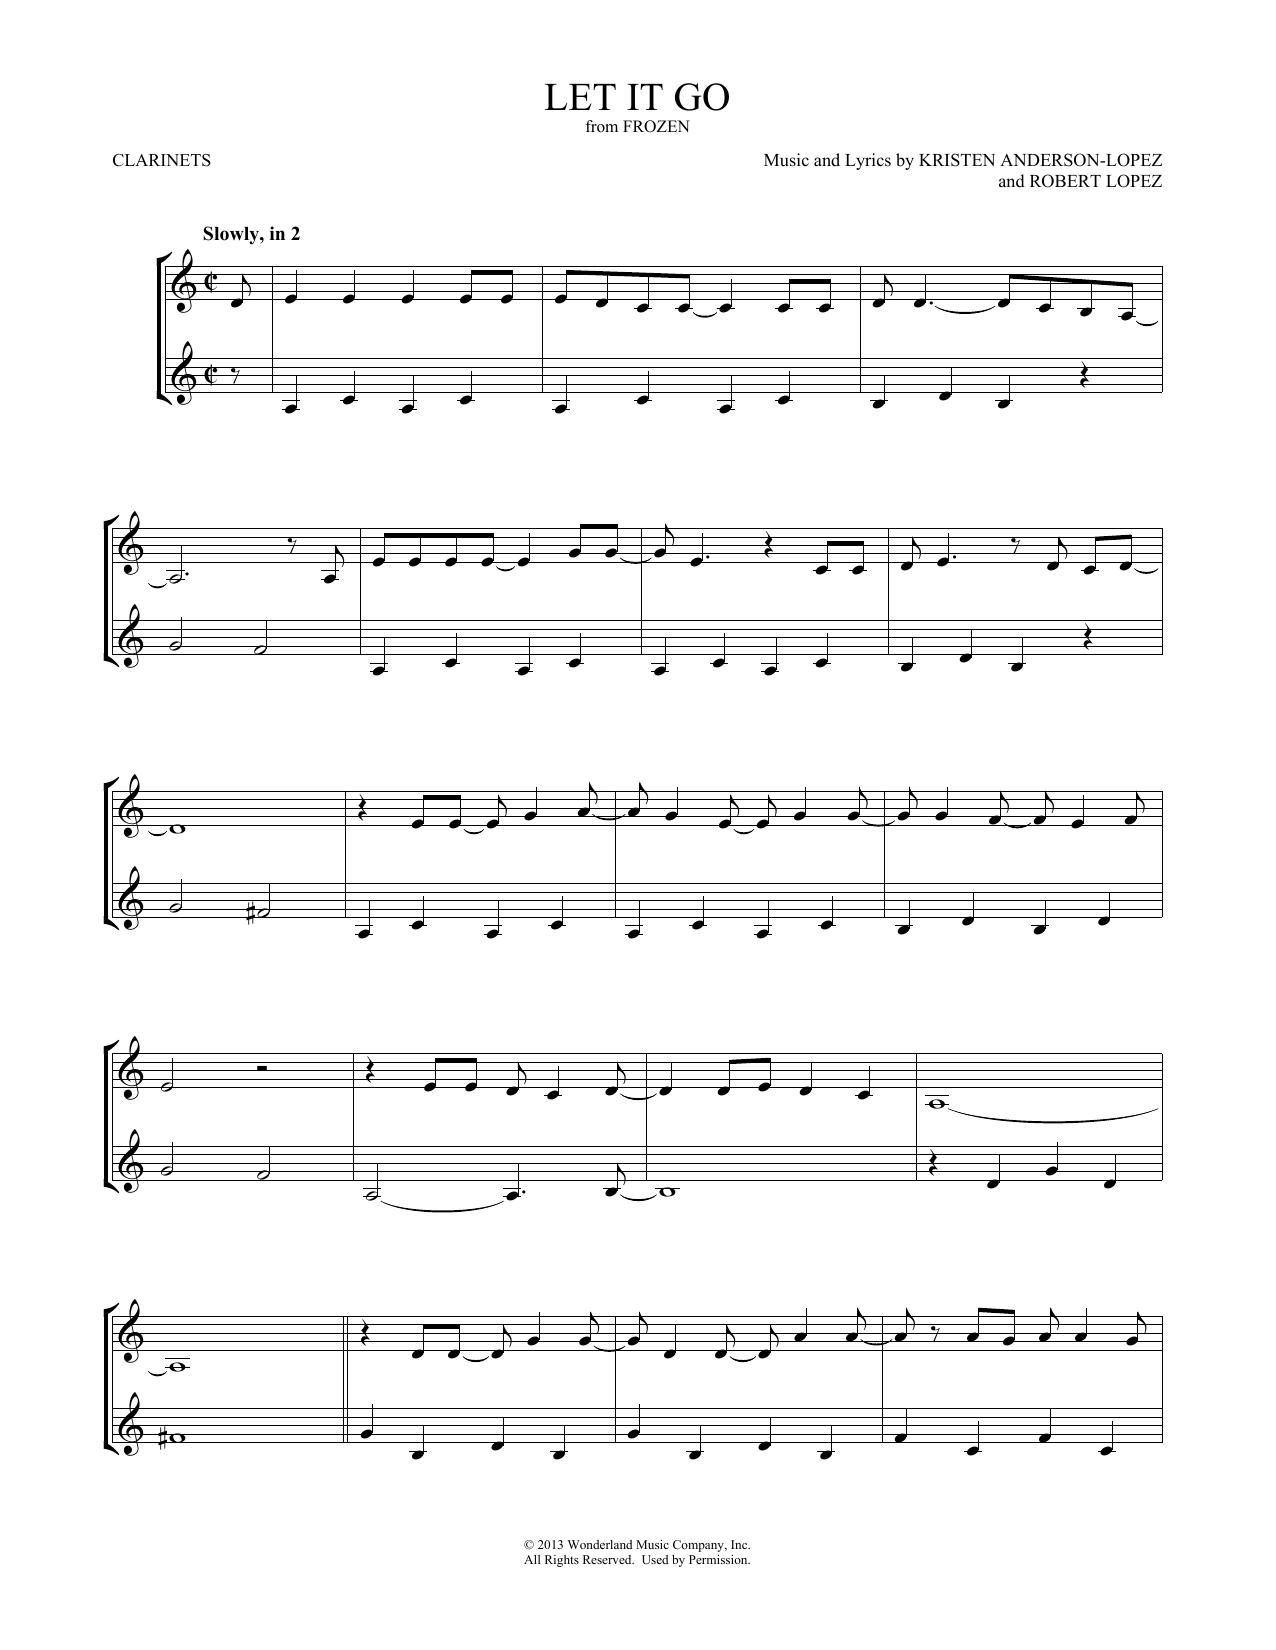 Let It Go (from Frozen) (Clarinet Duet)